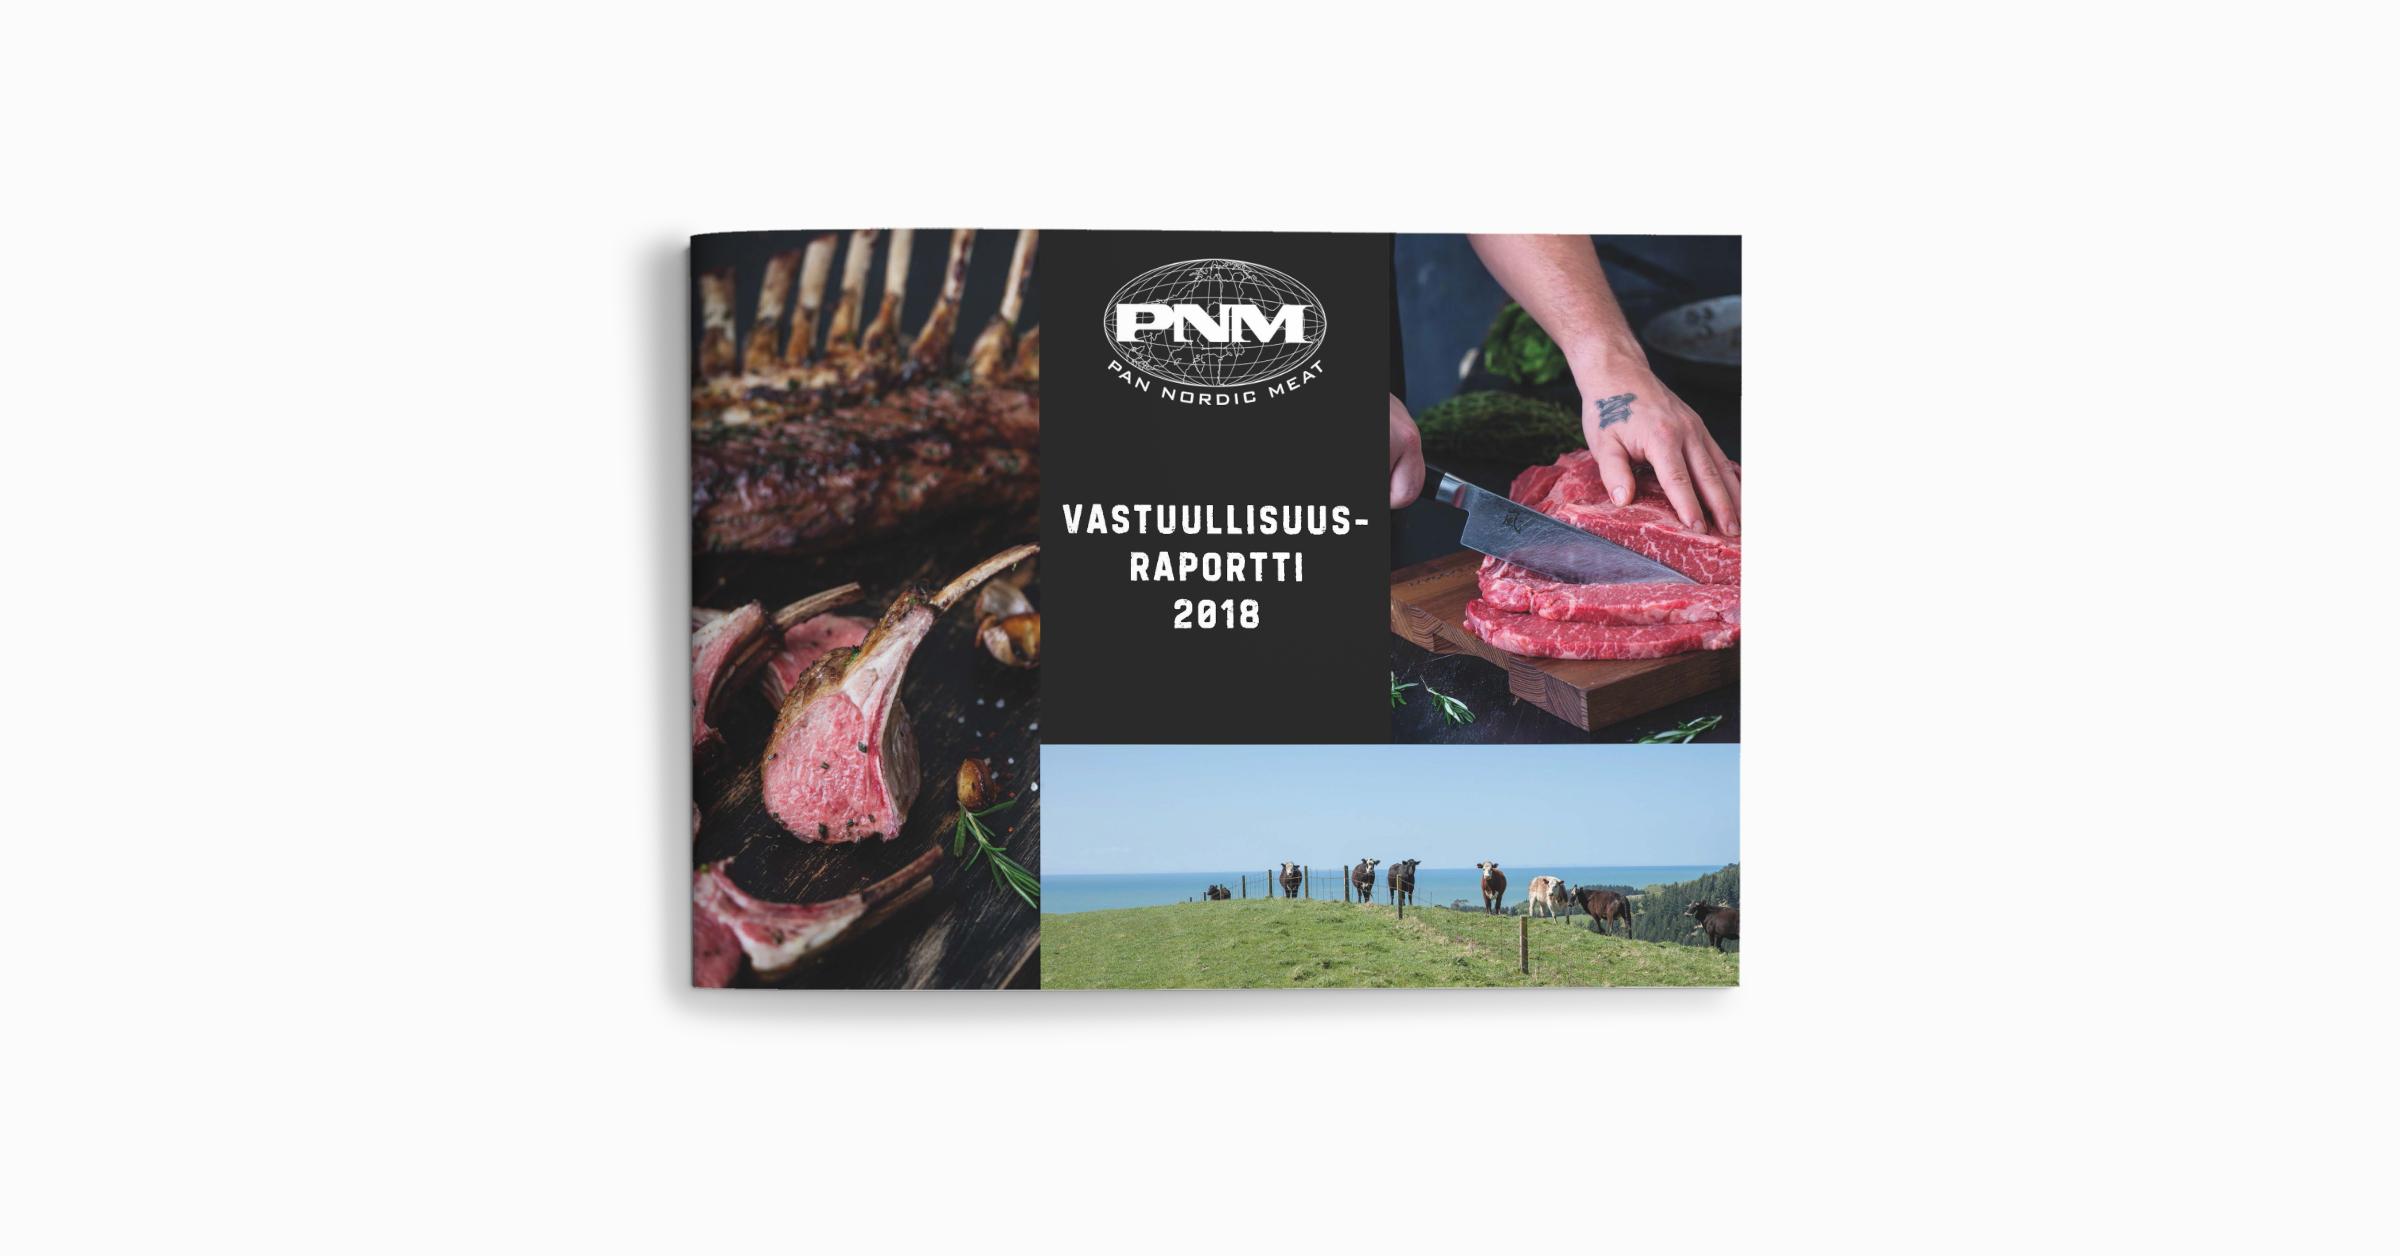 PNM_Vastuullisuusraportti_2018_kansi-2.jpg